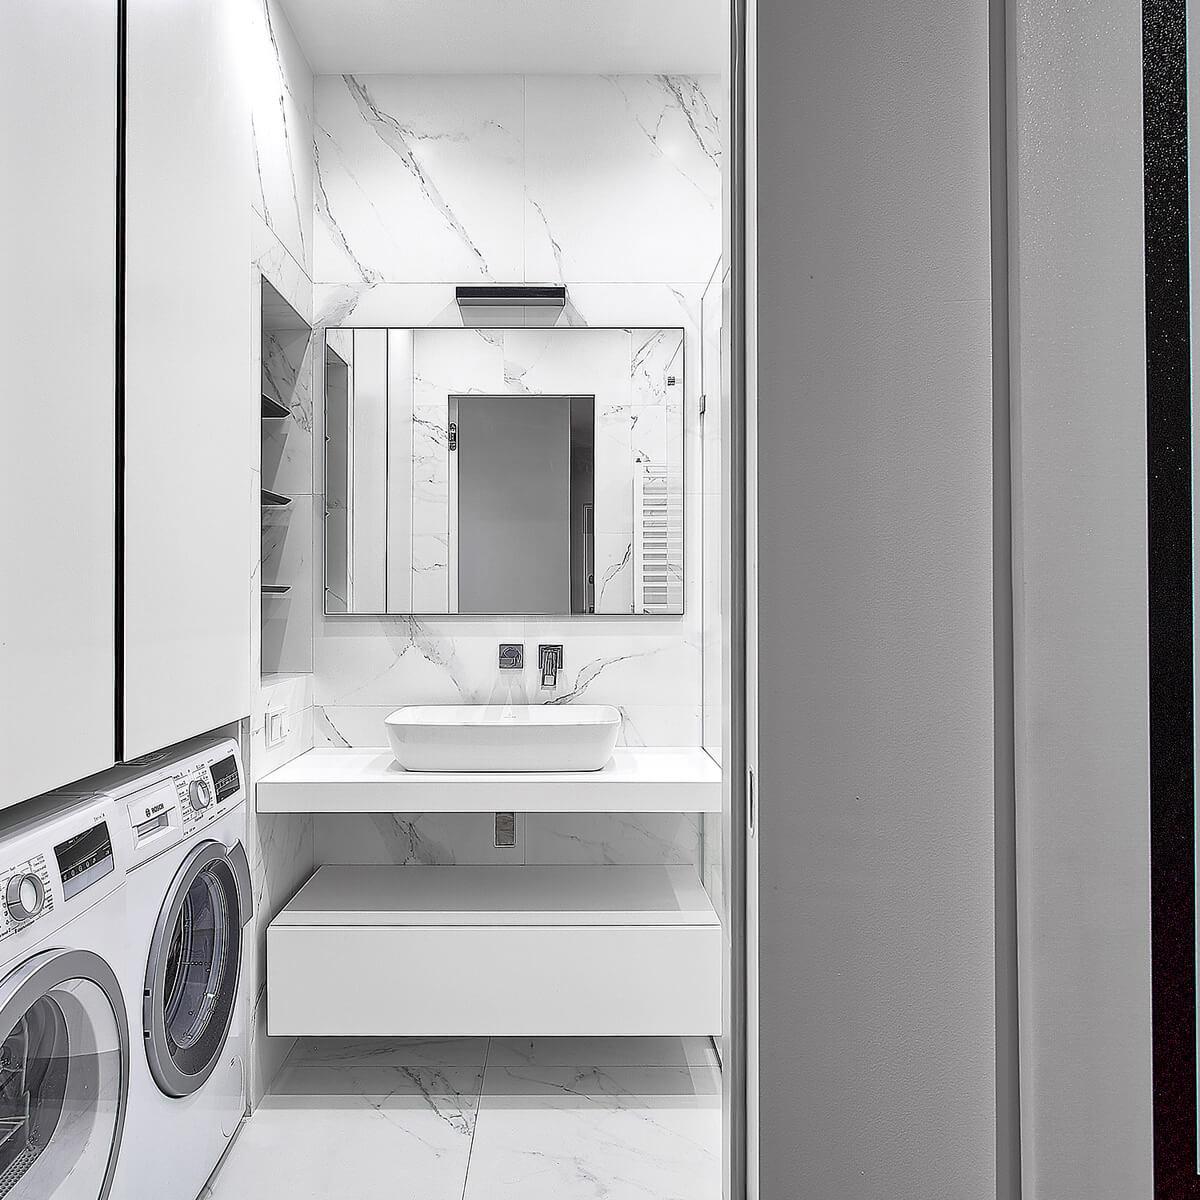 Дизайн интерьера, дизайн квартиры, дизайн дома